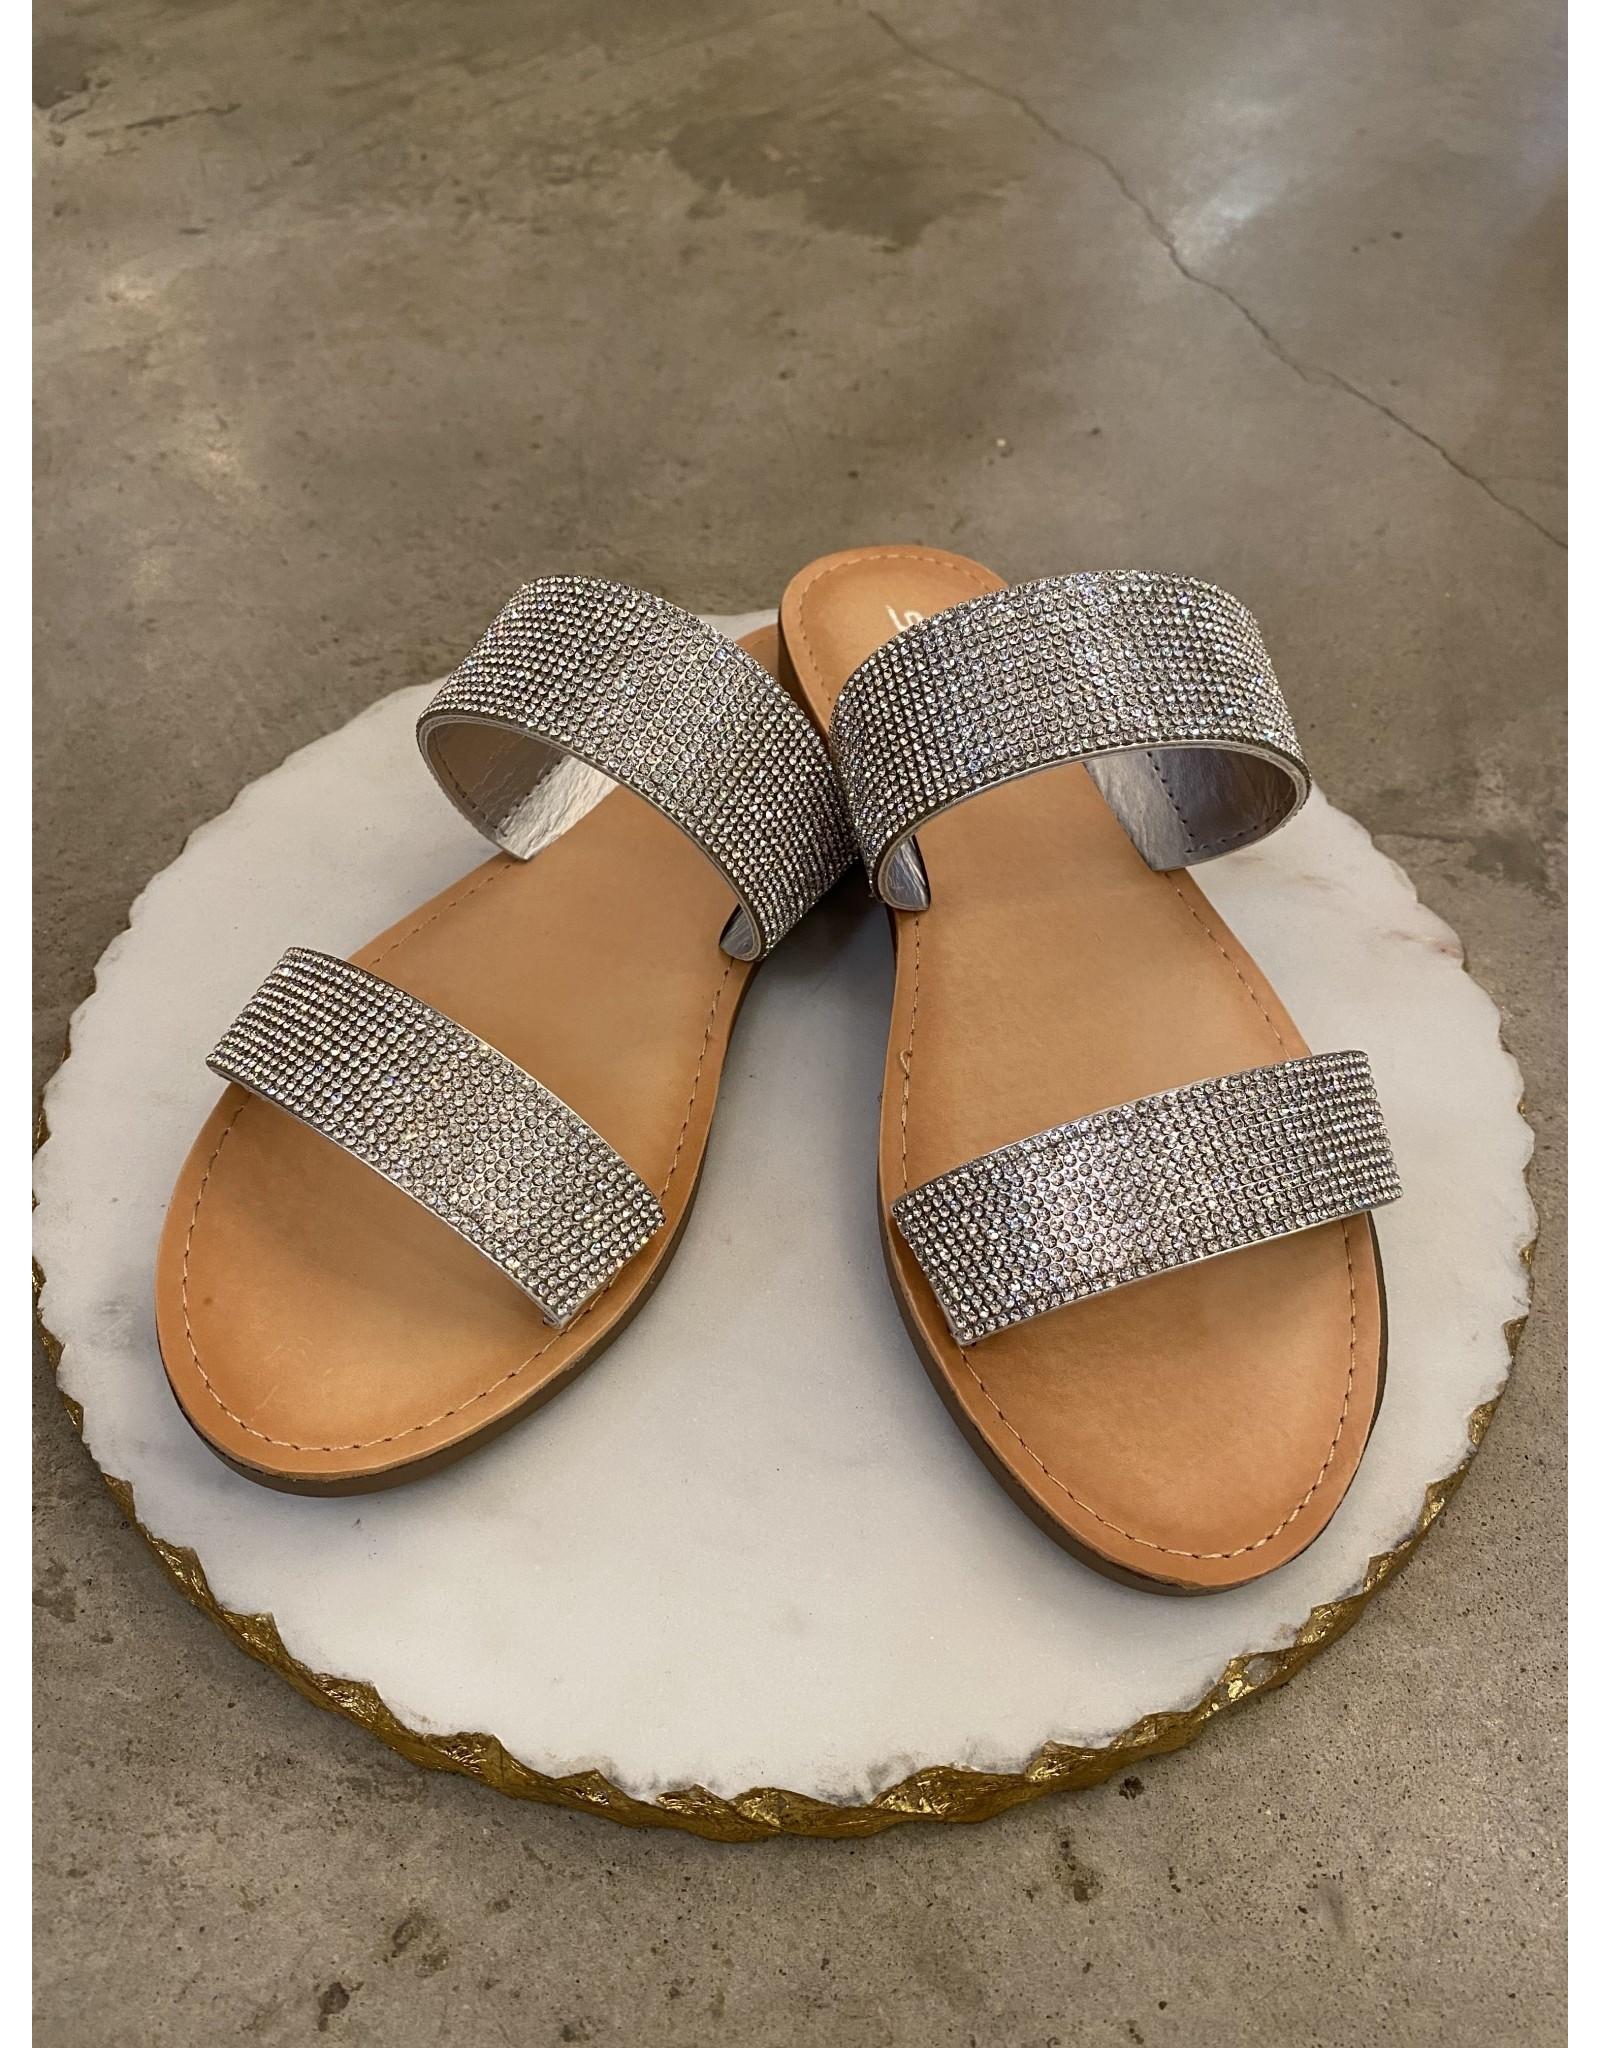 Among Sandal in Silver Rhinestones